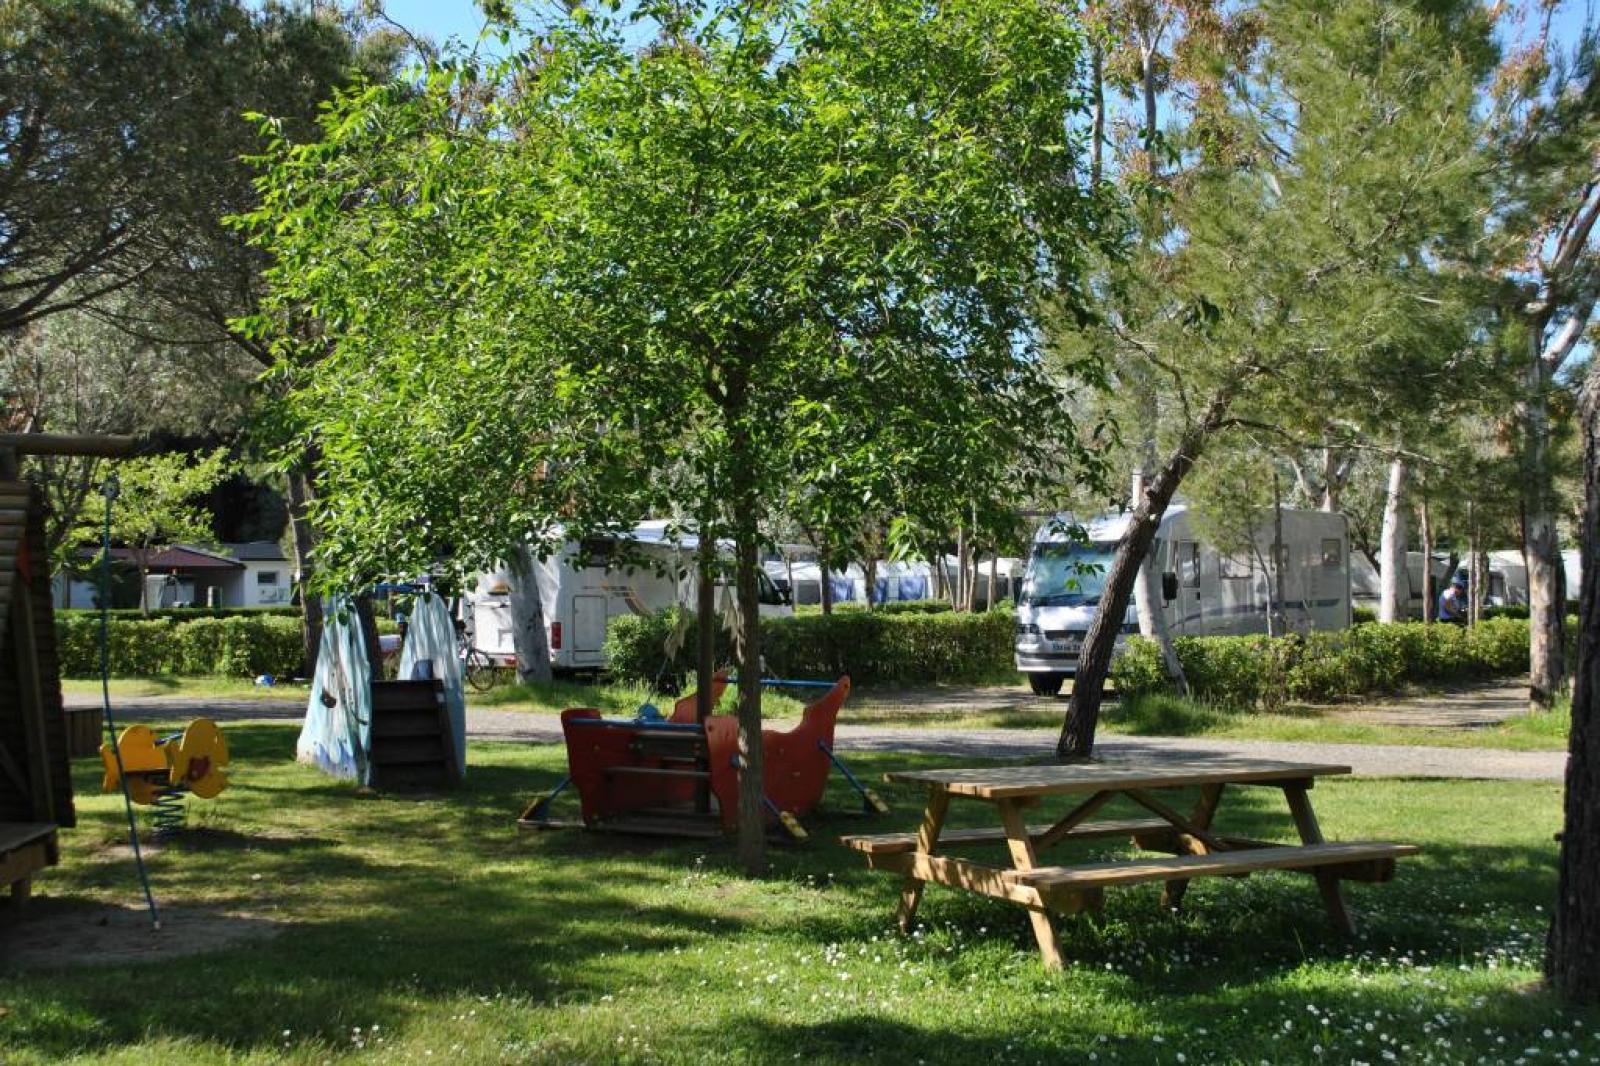 Camping village toscana mare vacanze in campeggio toscana piazzole - Camping in toscana sul mare con piscina ...